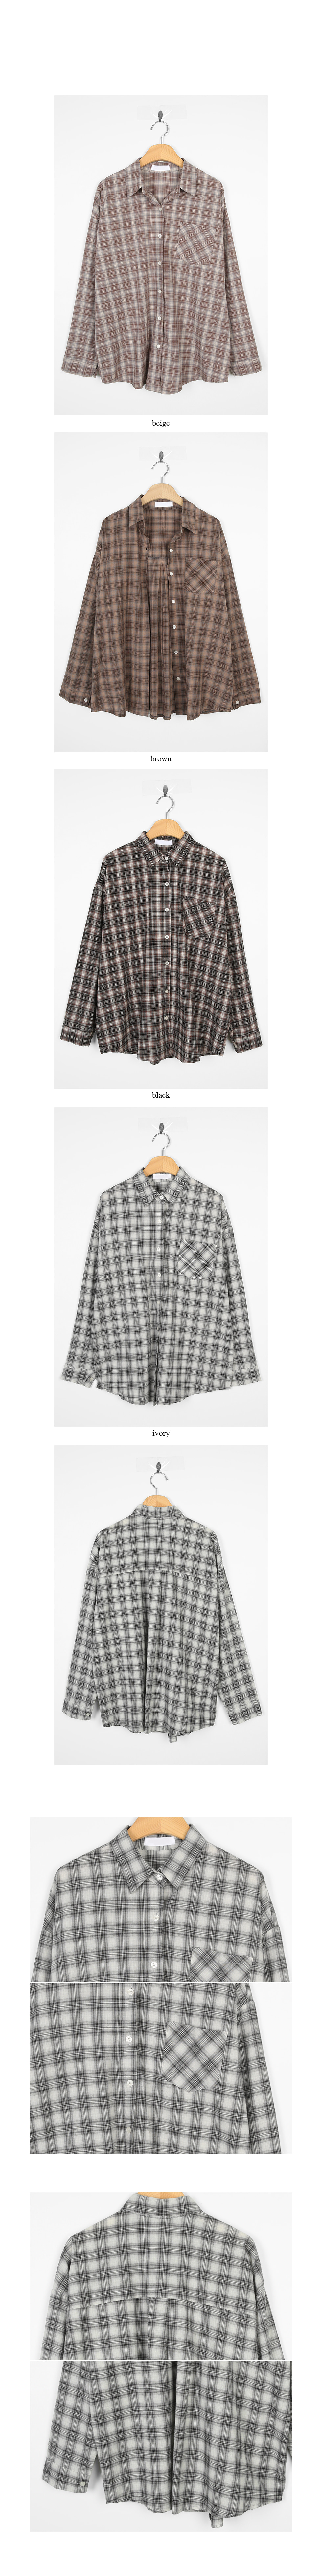 cozy check loose shirts